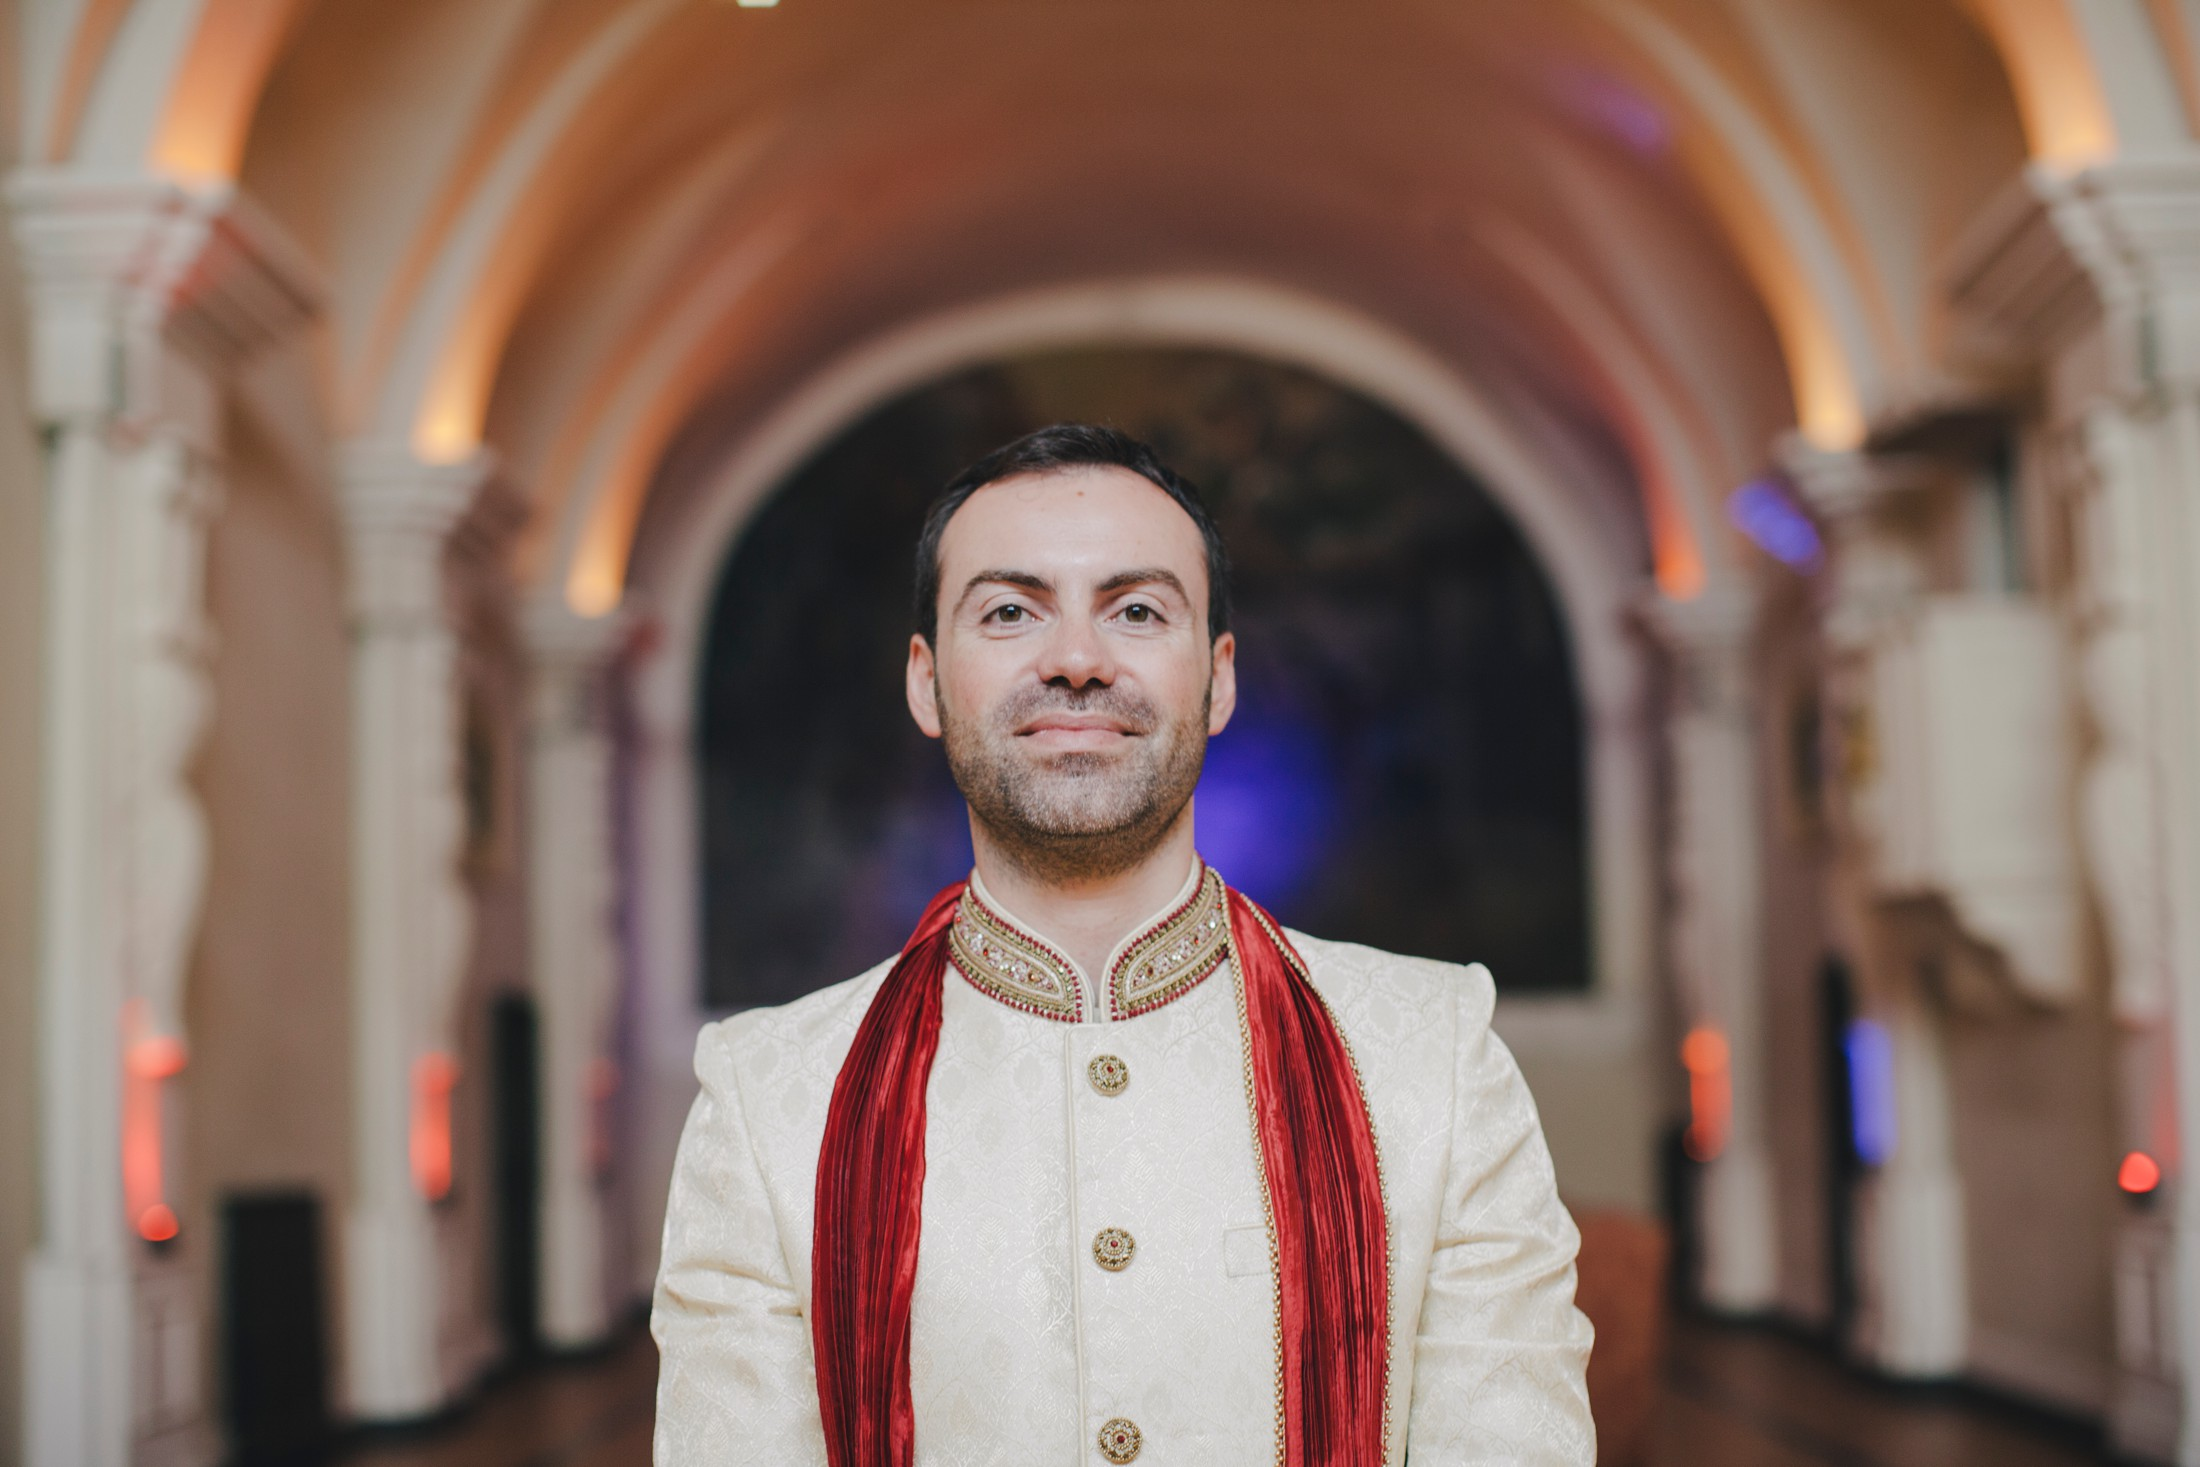 groom's portrait in typical indian wedding suit